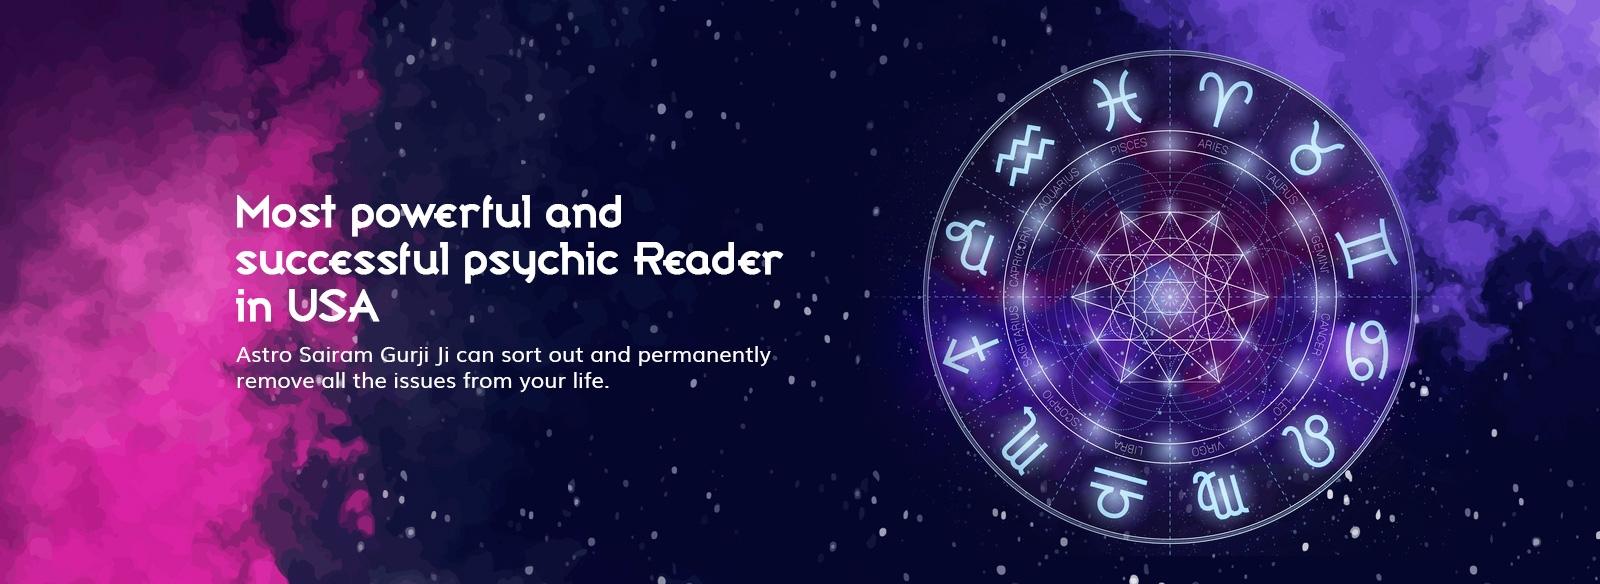 Best Indian Astrologer in California (@astrosairamguruji) Cover Image